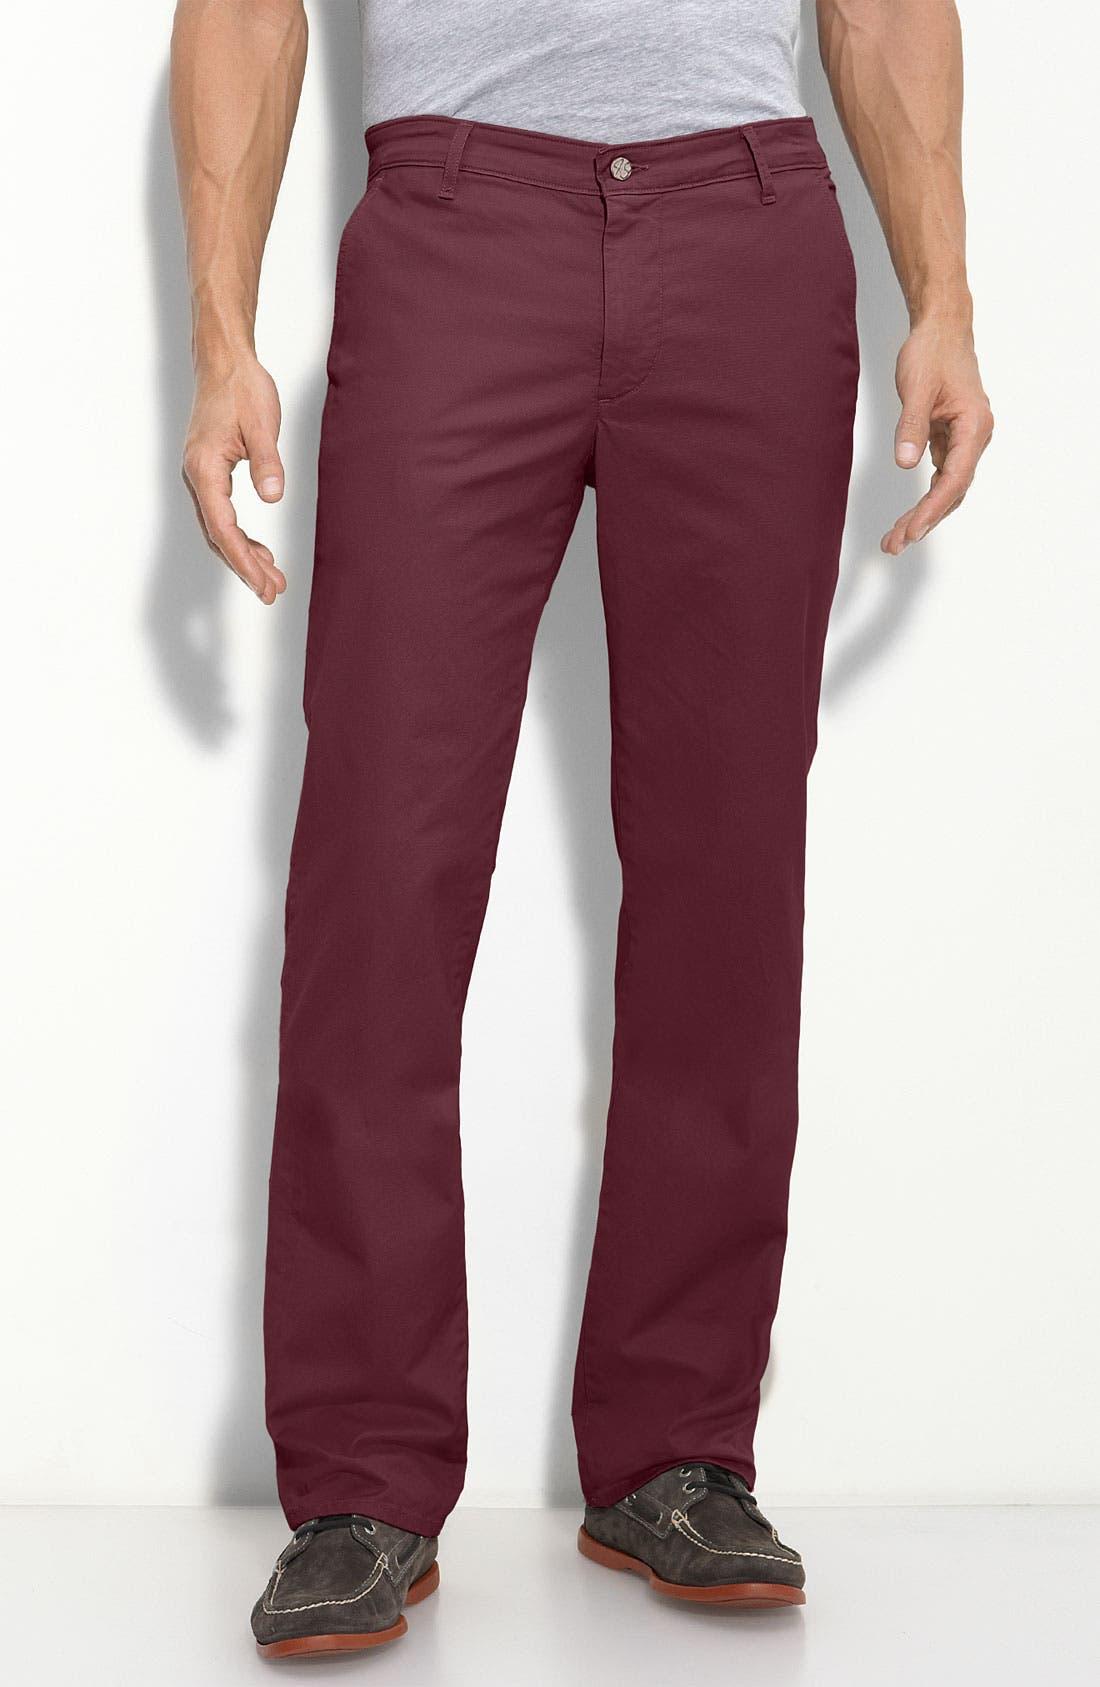 Main Image - Wallin & Bros. Sport Shirt & AG Jeans Pants